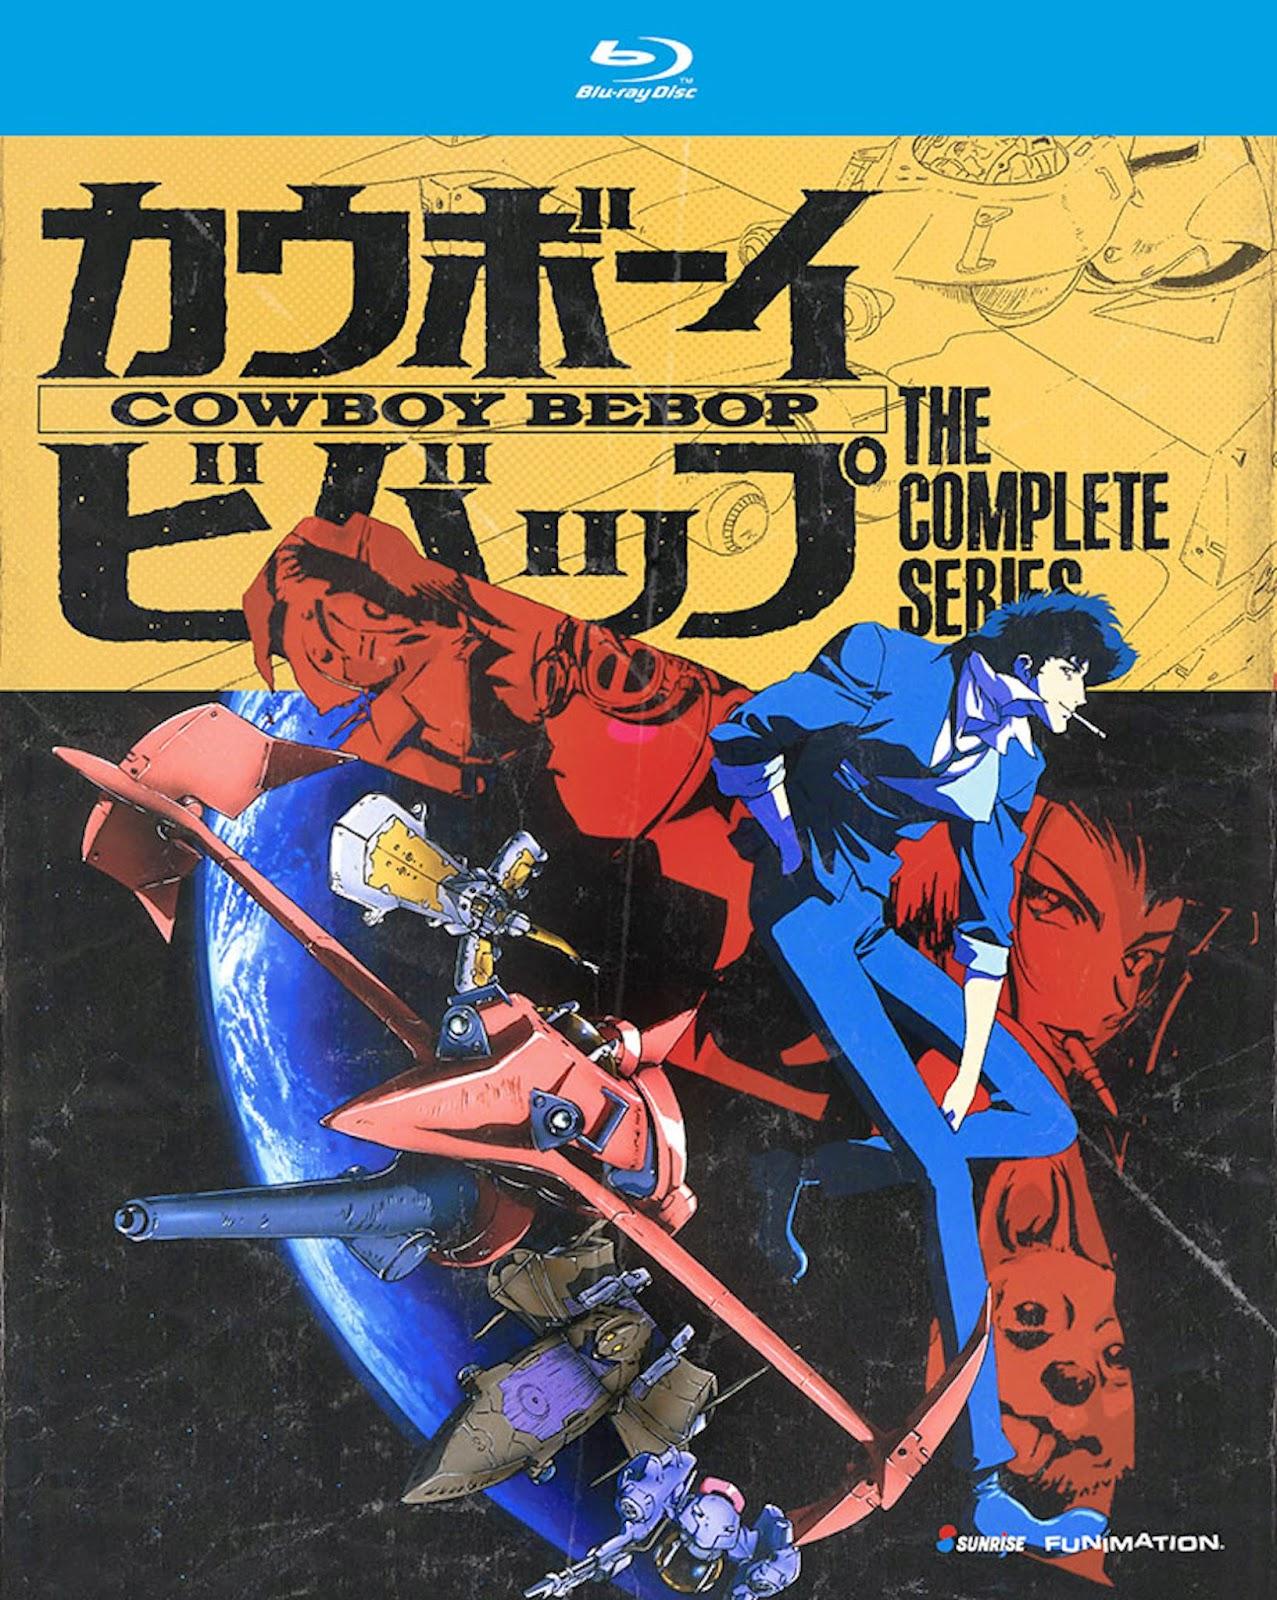 Cowboy bebop 6 latino dating 8